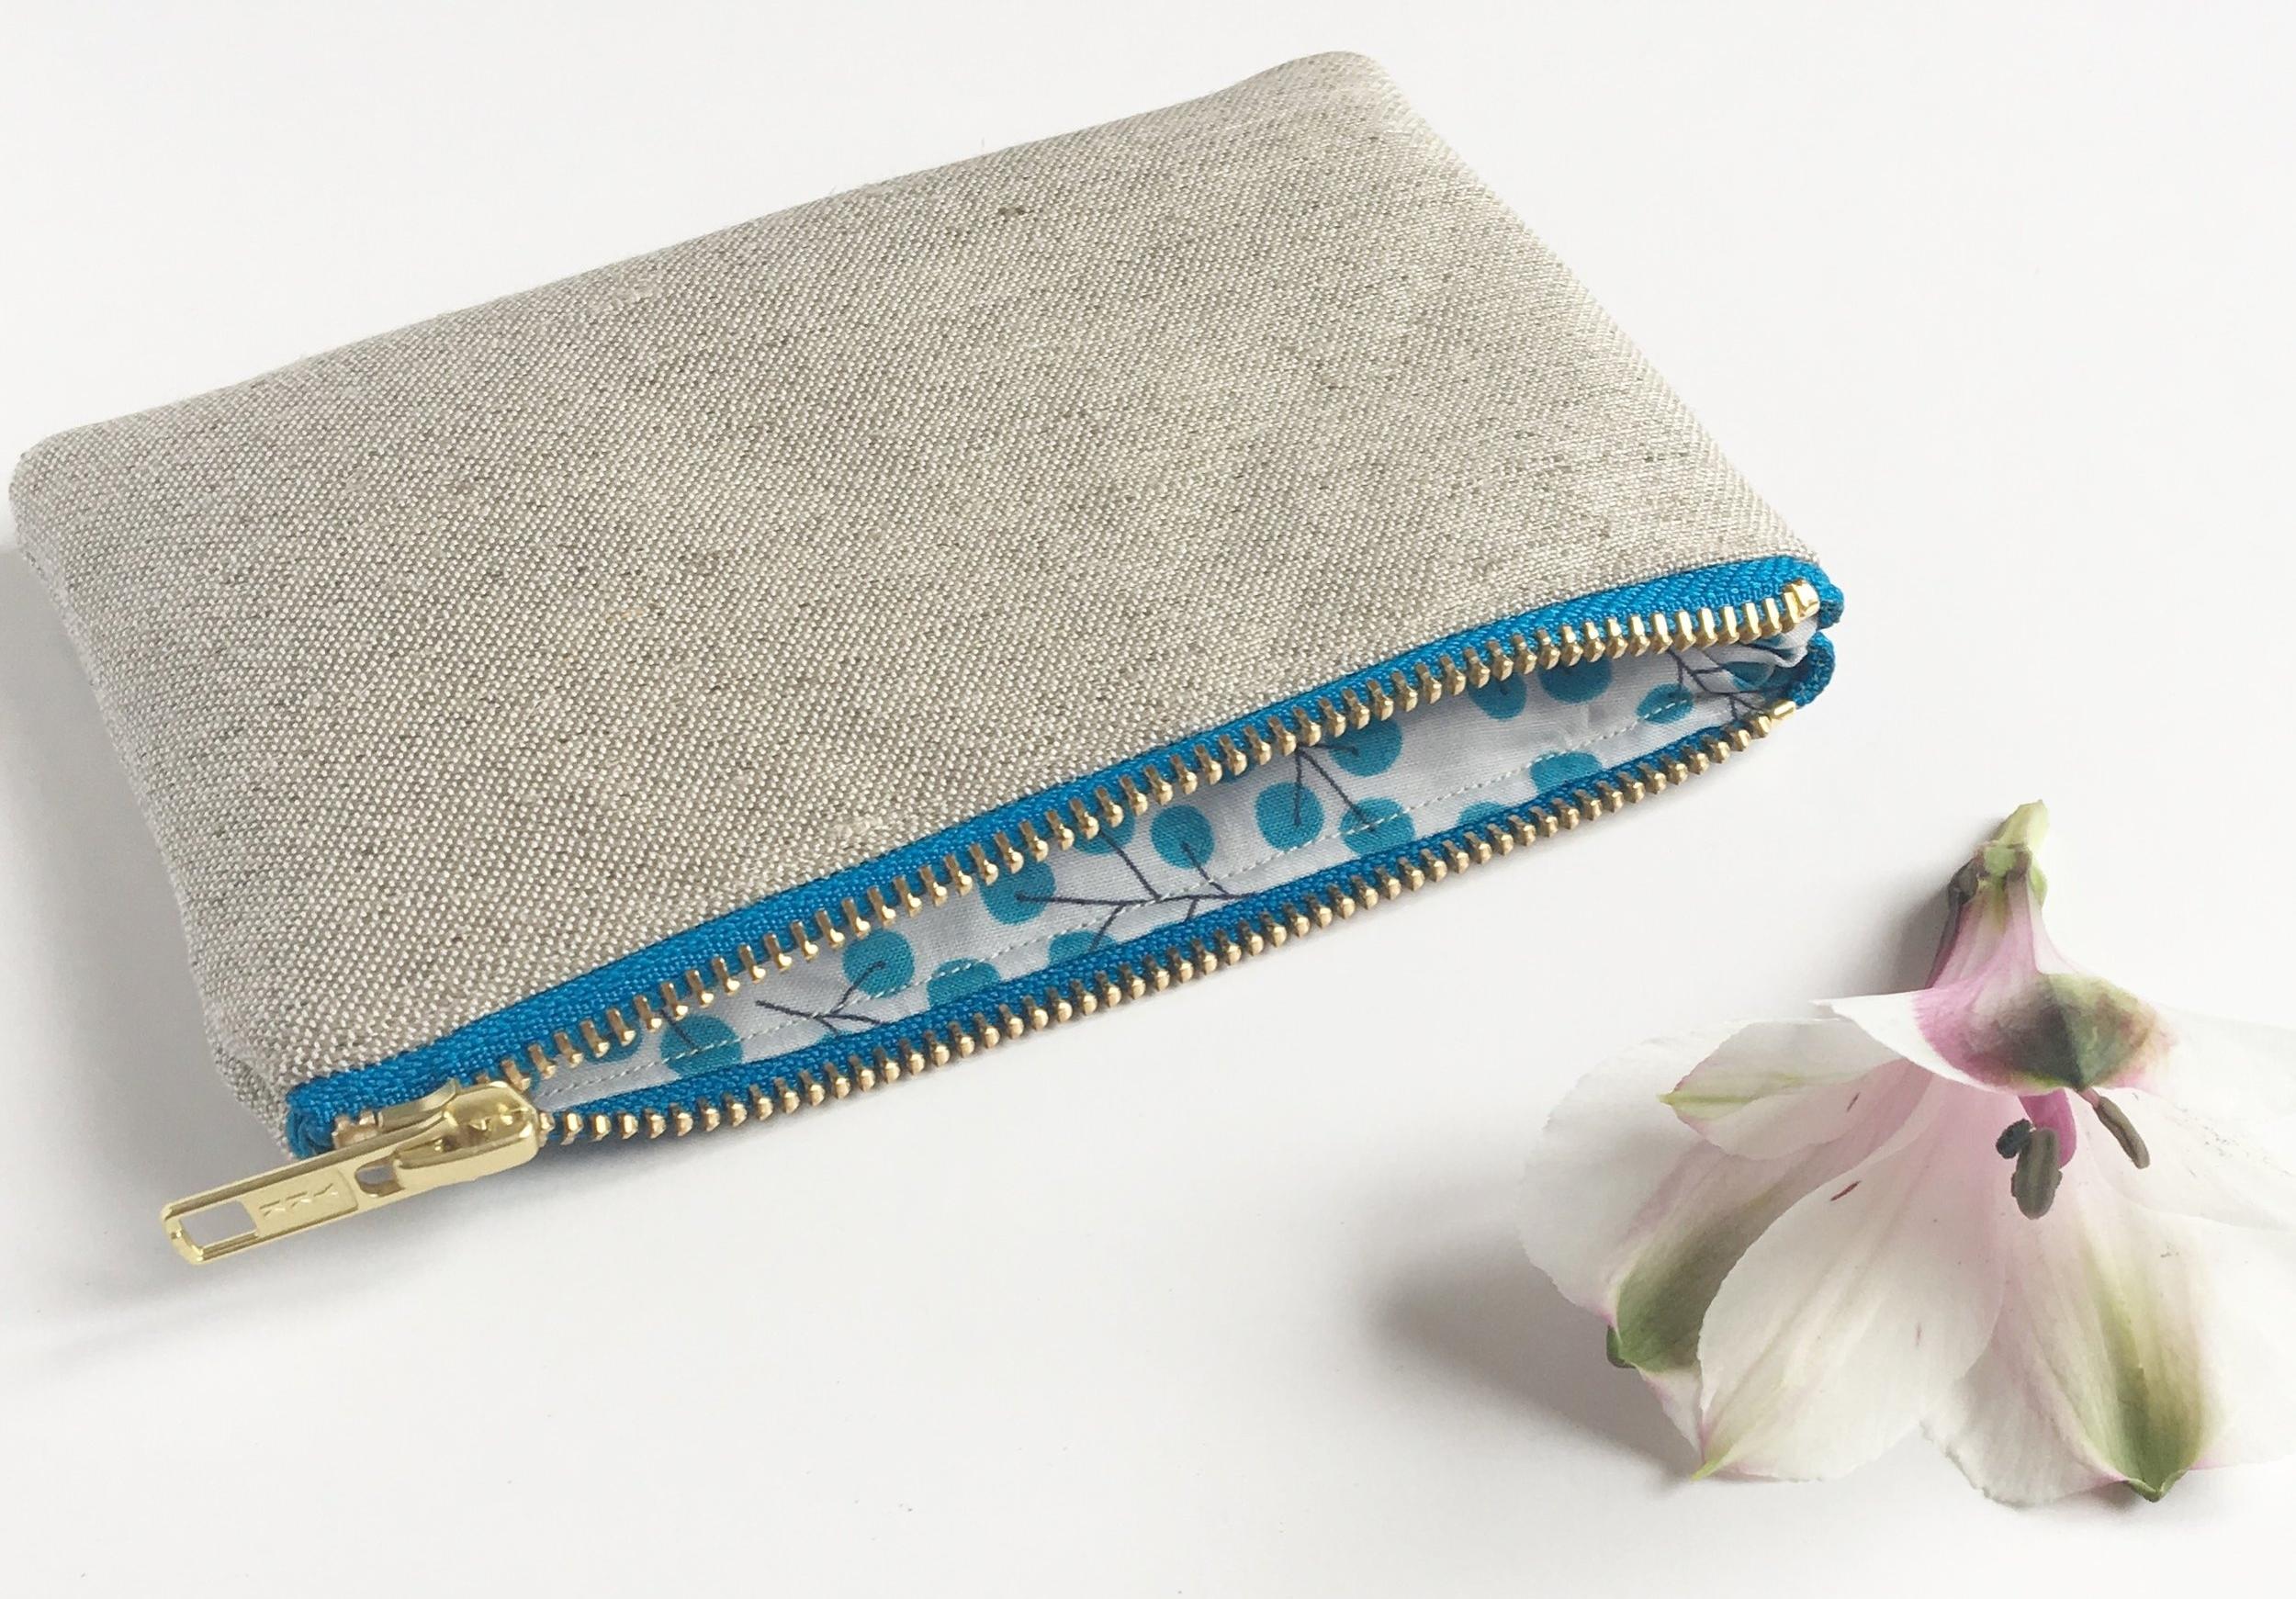 Berries Blue Collection Organic hemp-cotton purse